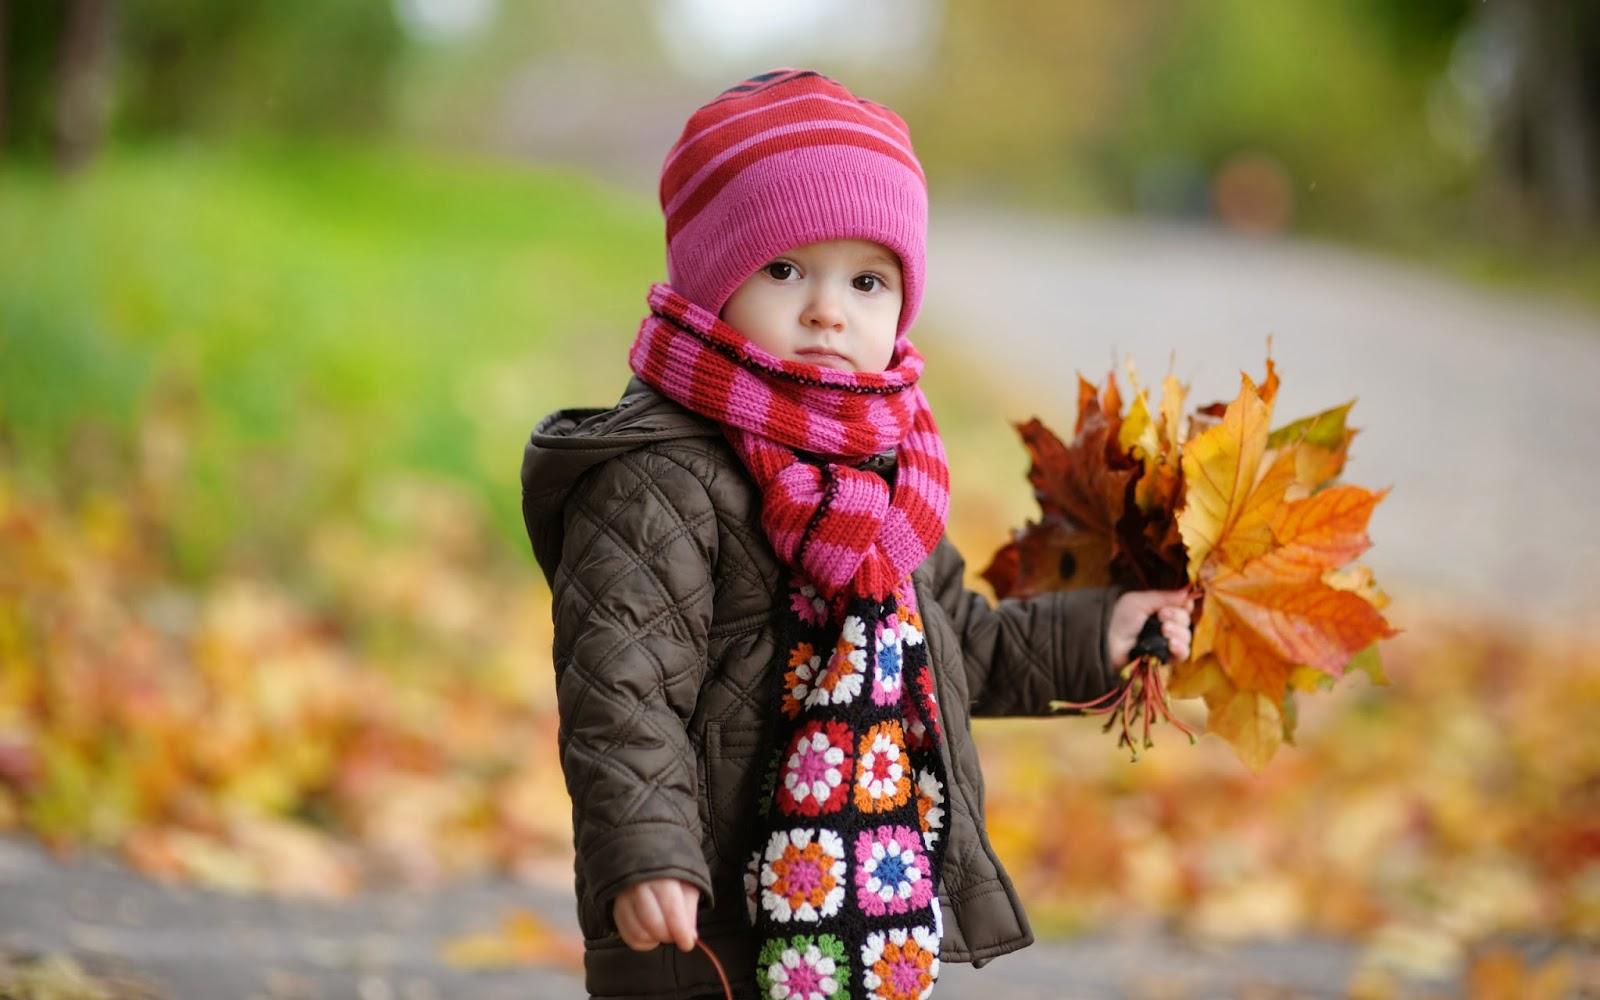 "<img src=""http://4.bp.blogspot.com/-vDYMokNCvpk/Uud4sJsteLI/AAAAAAAAKdk/XBvnp7-lT2w/s1600/cute-baby-in-autumn-wallpaper.jpg"" alt=""cute baby in autumn wallpaper"" />"